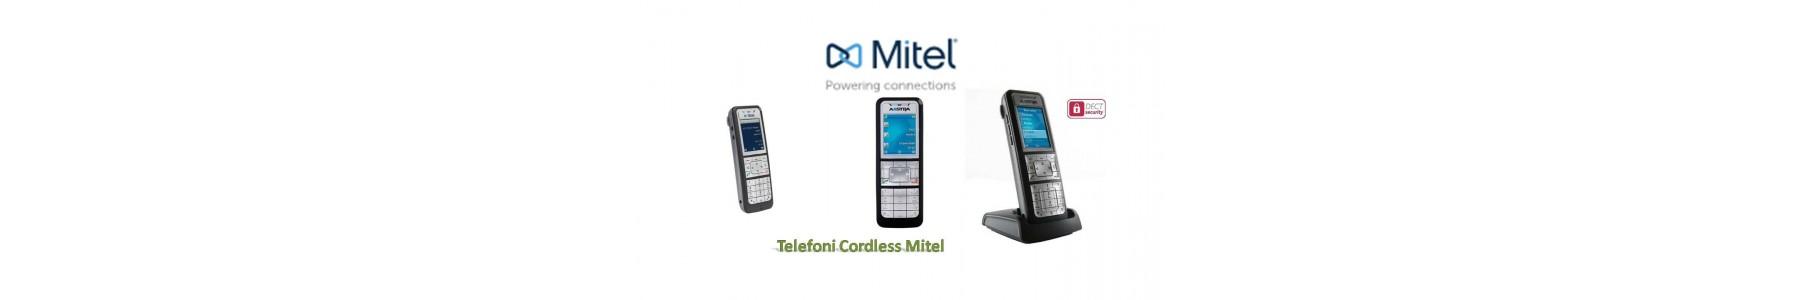 Telefoni Cordless Mitel